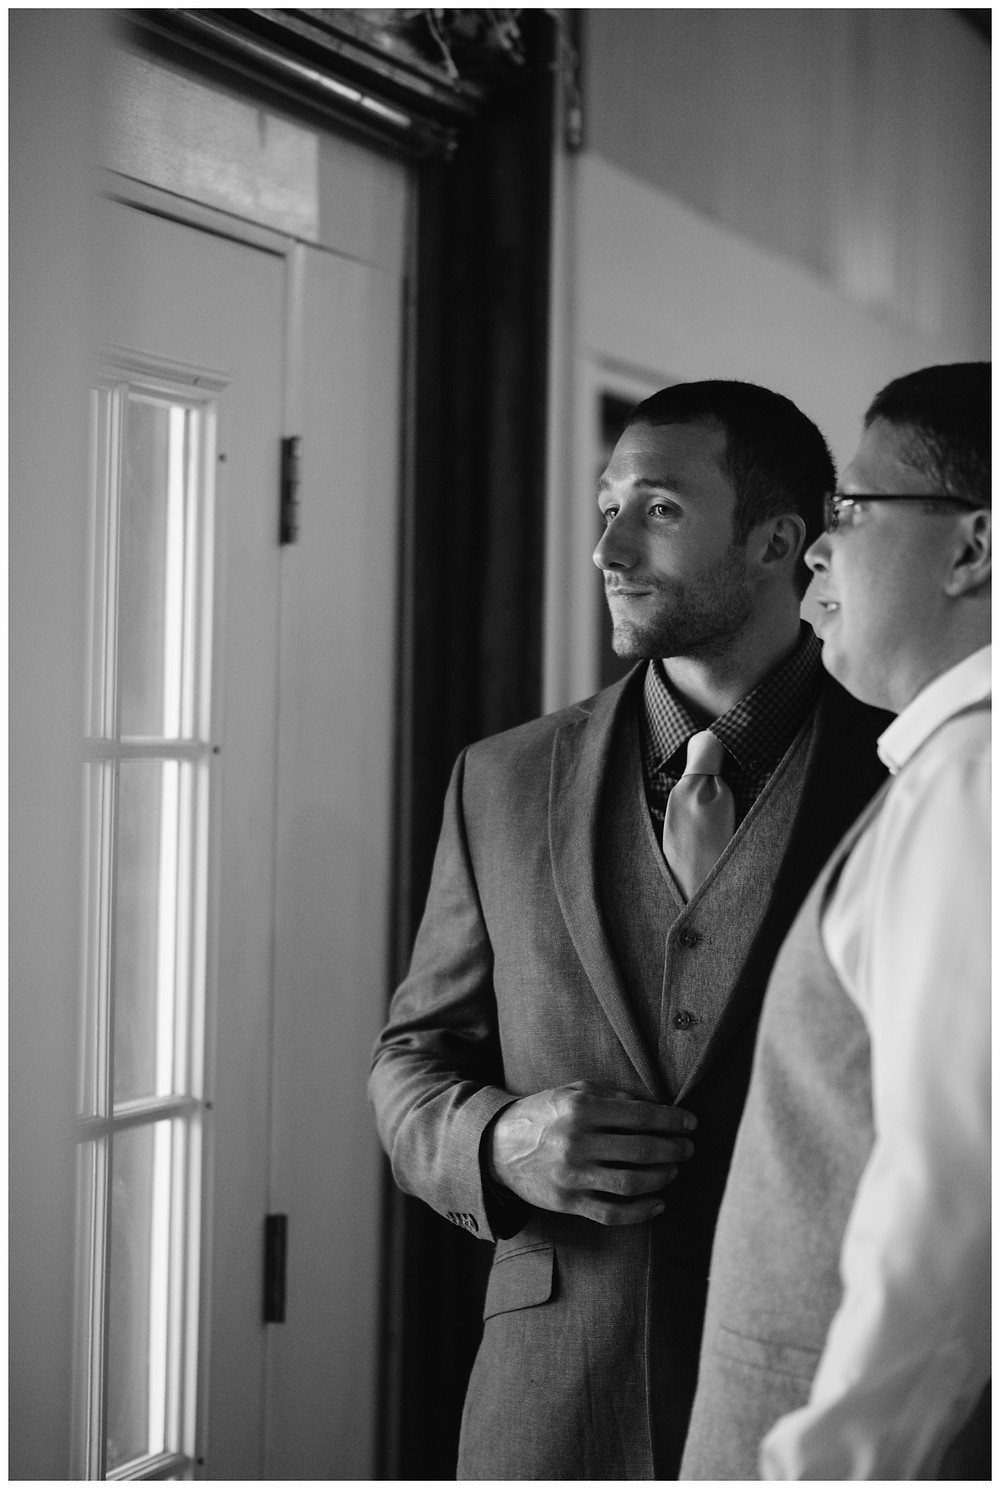 groom-before-ceremony-at-brighton-acres-wedding-by-milwaukee-wedding-photographer-kyra-rane-photography